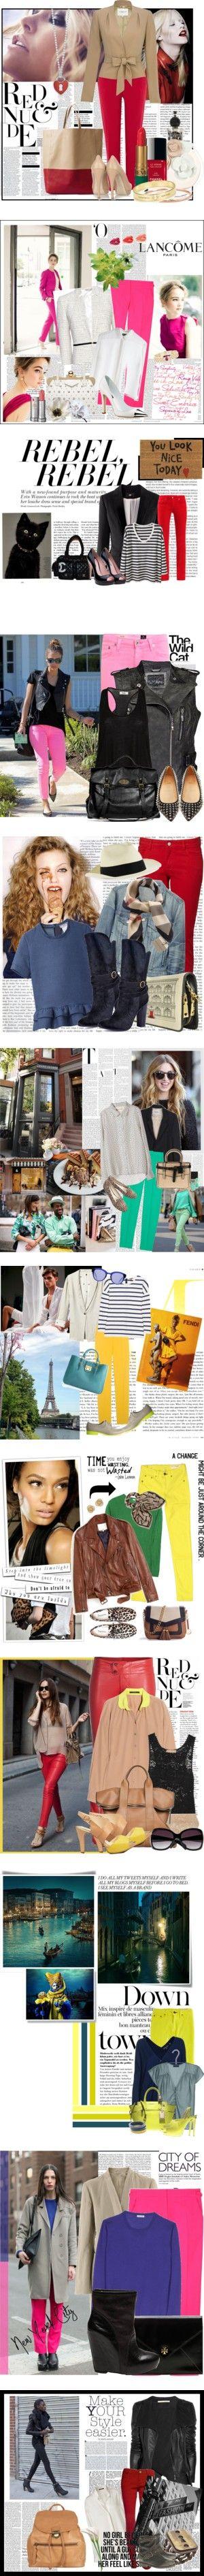 Bright pants by fahionfreak7 on Polyvore featuring мода, Warehouse, Valentino, Chanel, Revlon, CÉLINE, Miu Miu, Tiffany & Co., skinny pants and celine